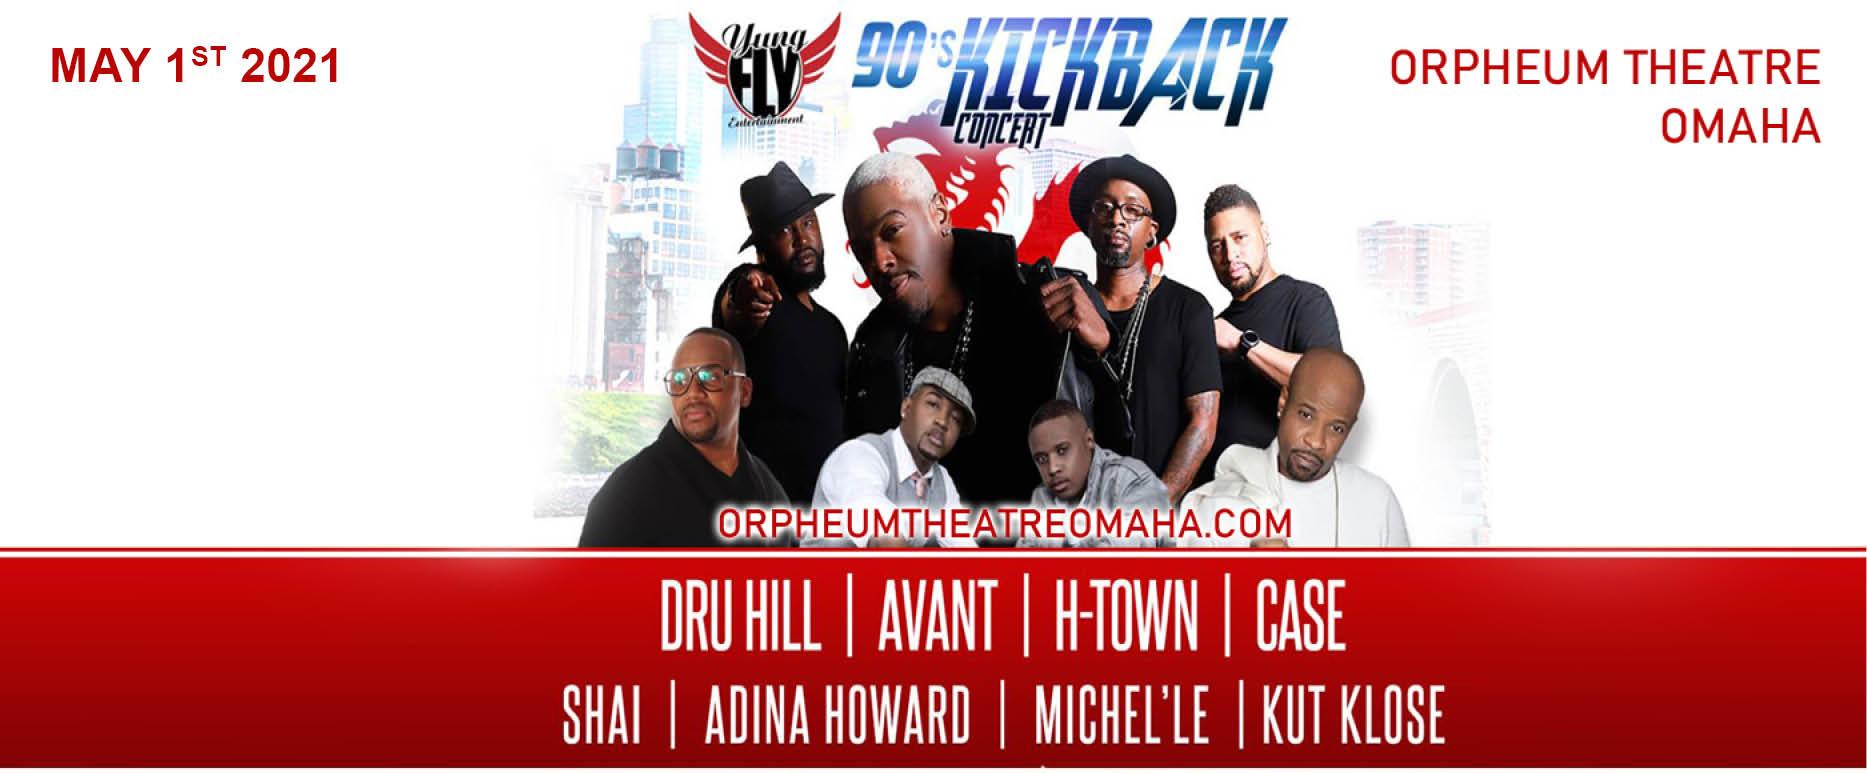 90s Kickback Concert: Dru Hill, Avant, H-Town & Case [POSTPONED] at Orpheum Theatre Minneapolis